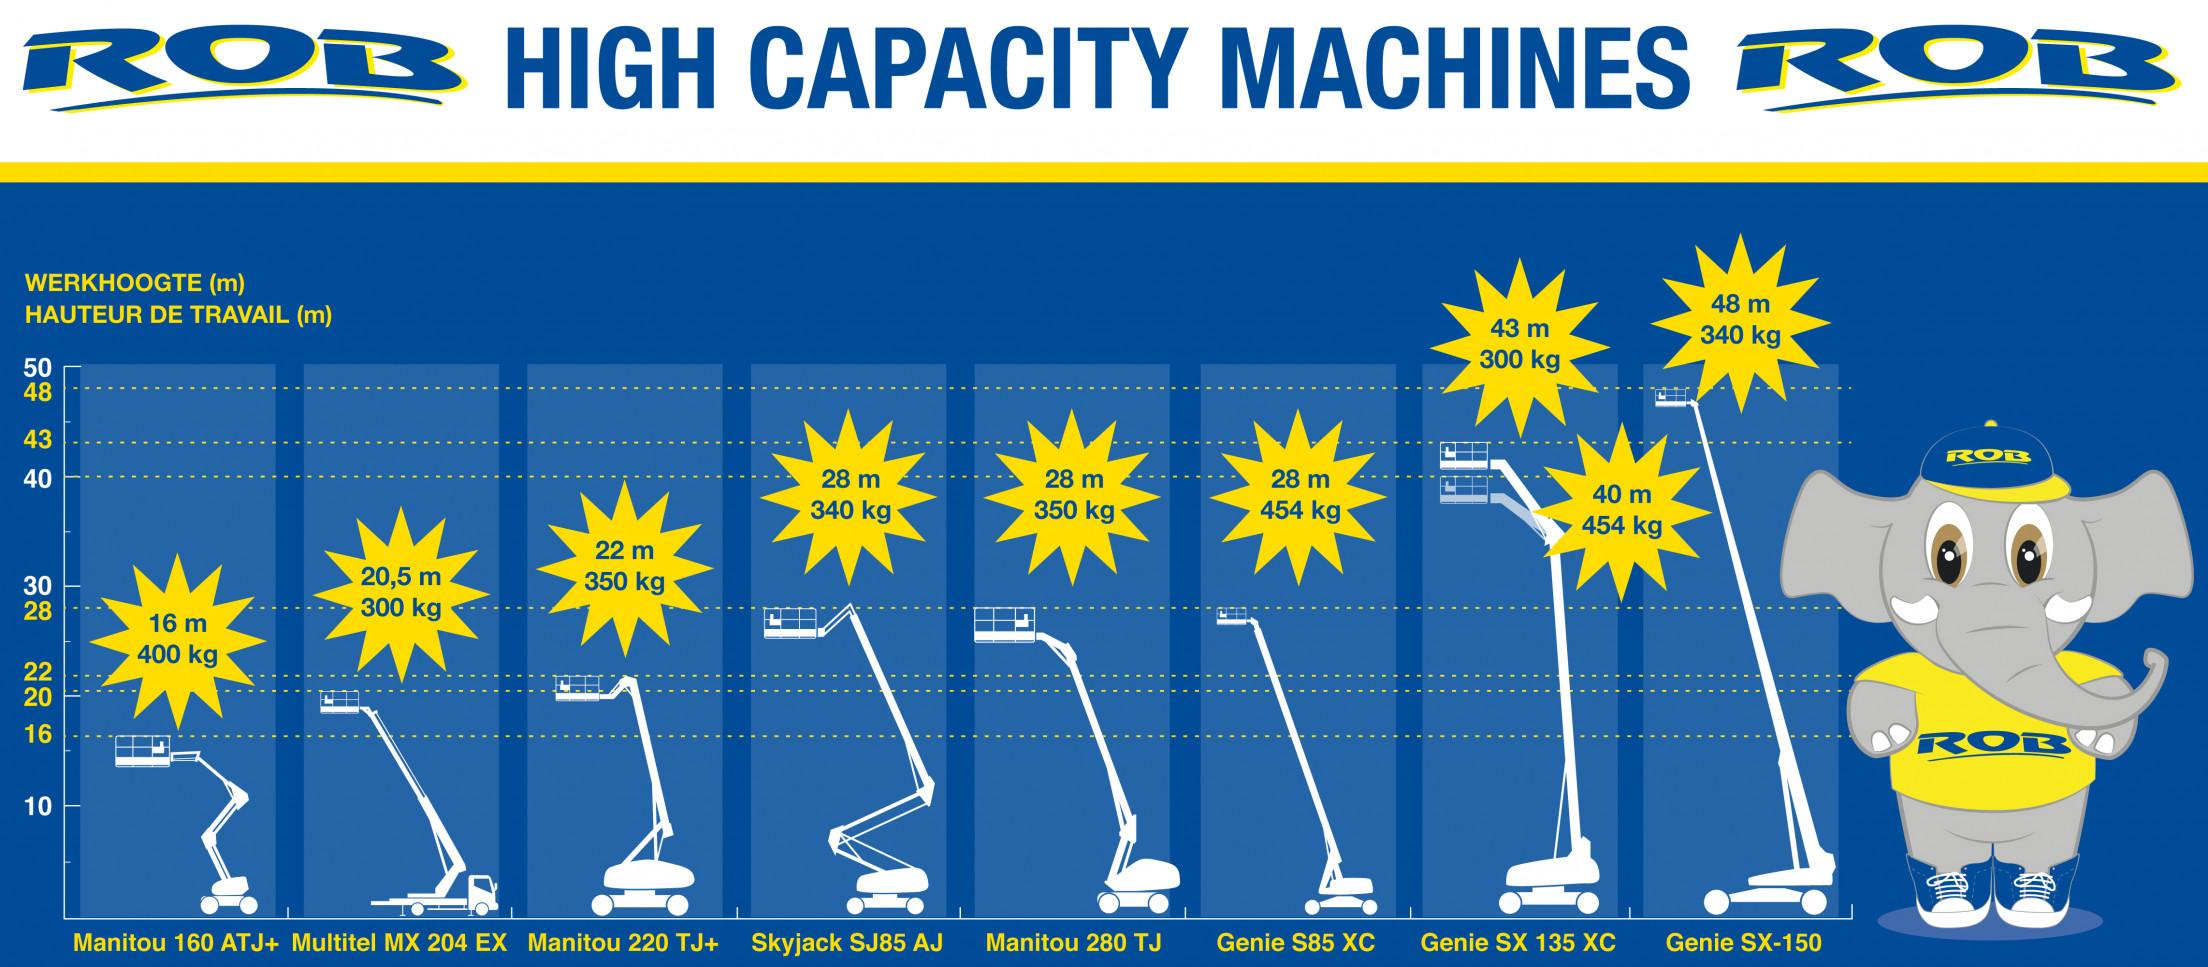 High Capacity